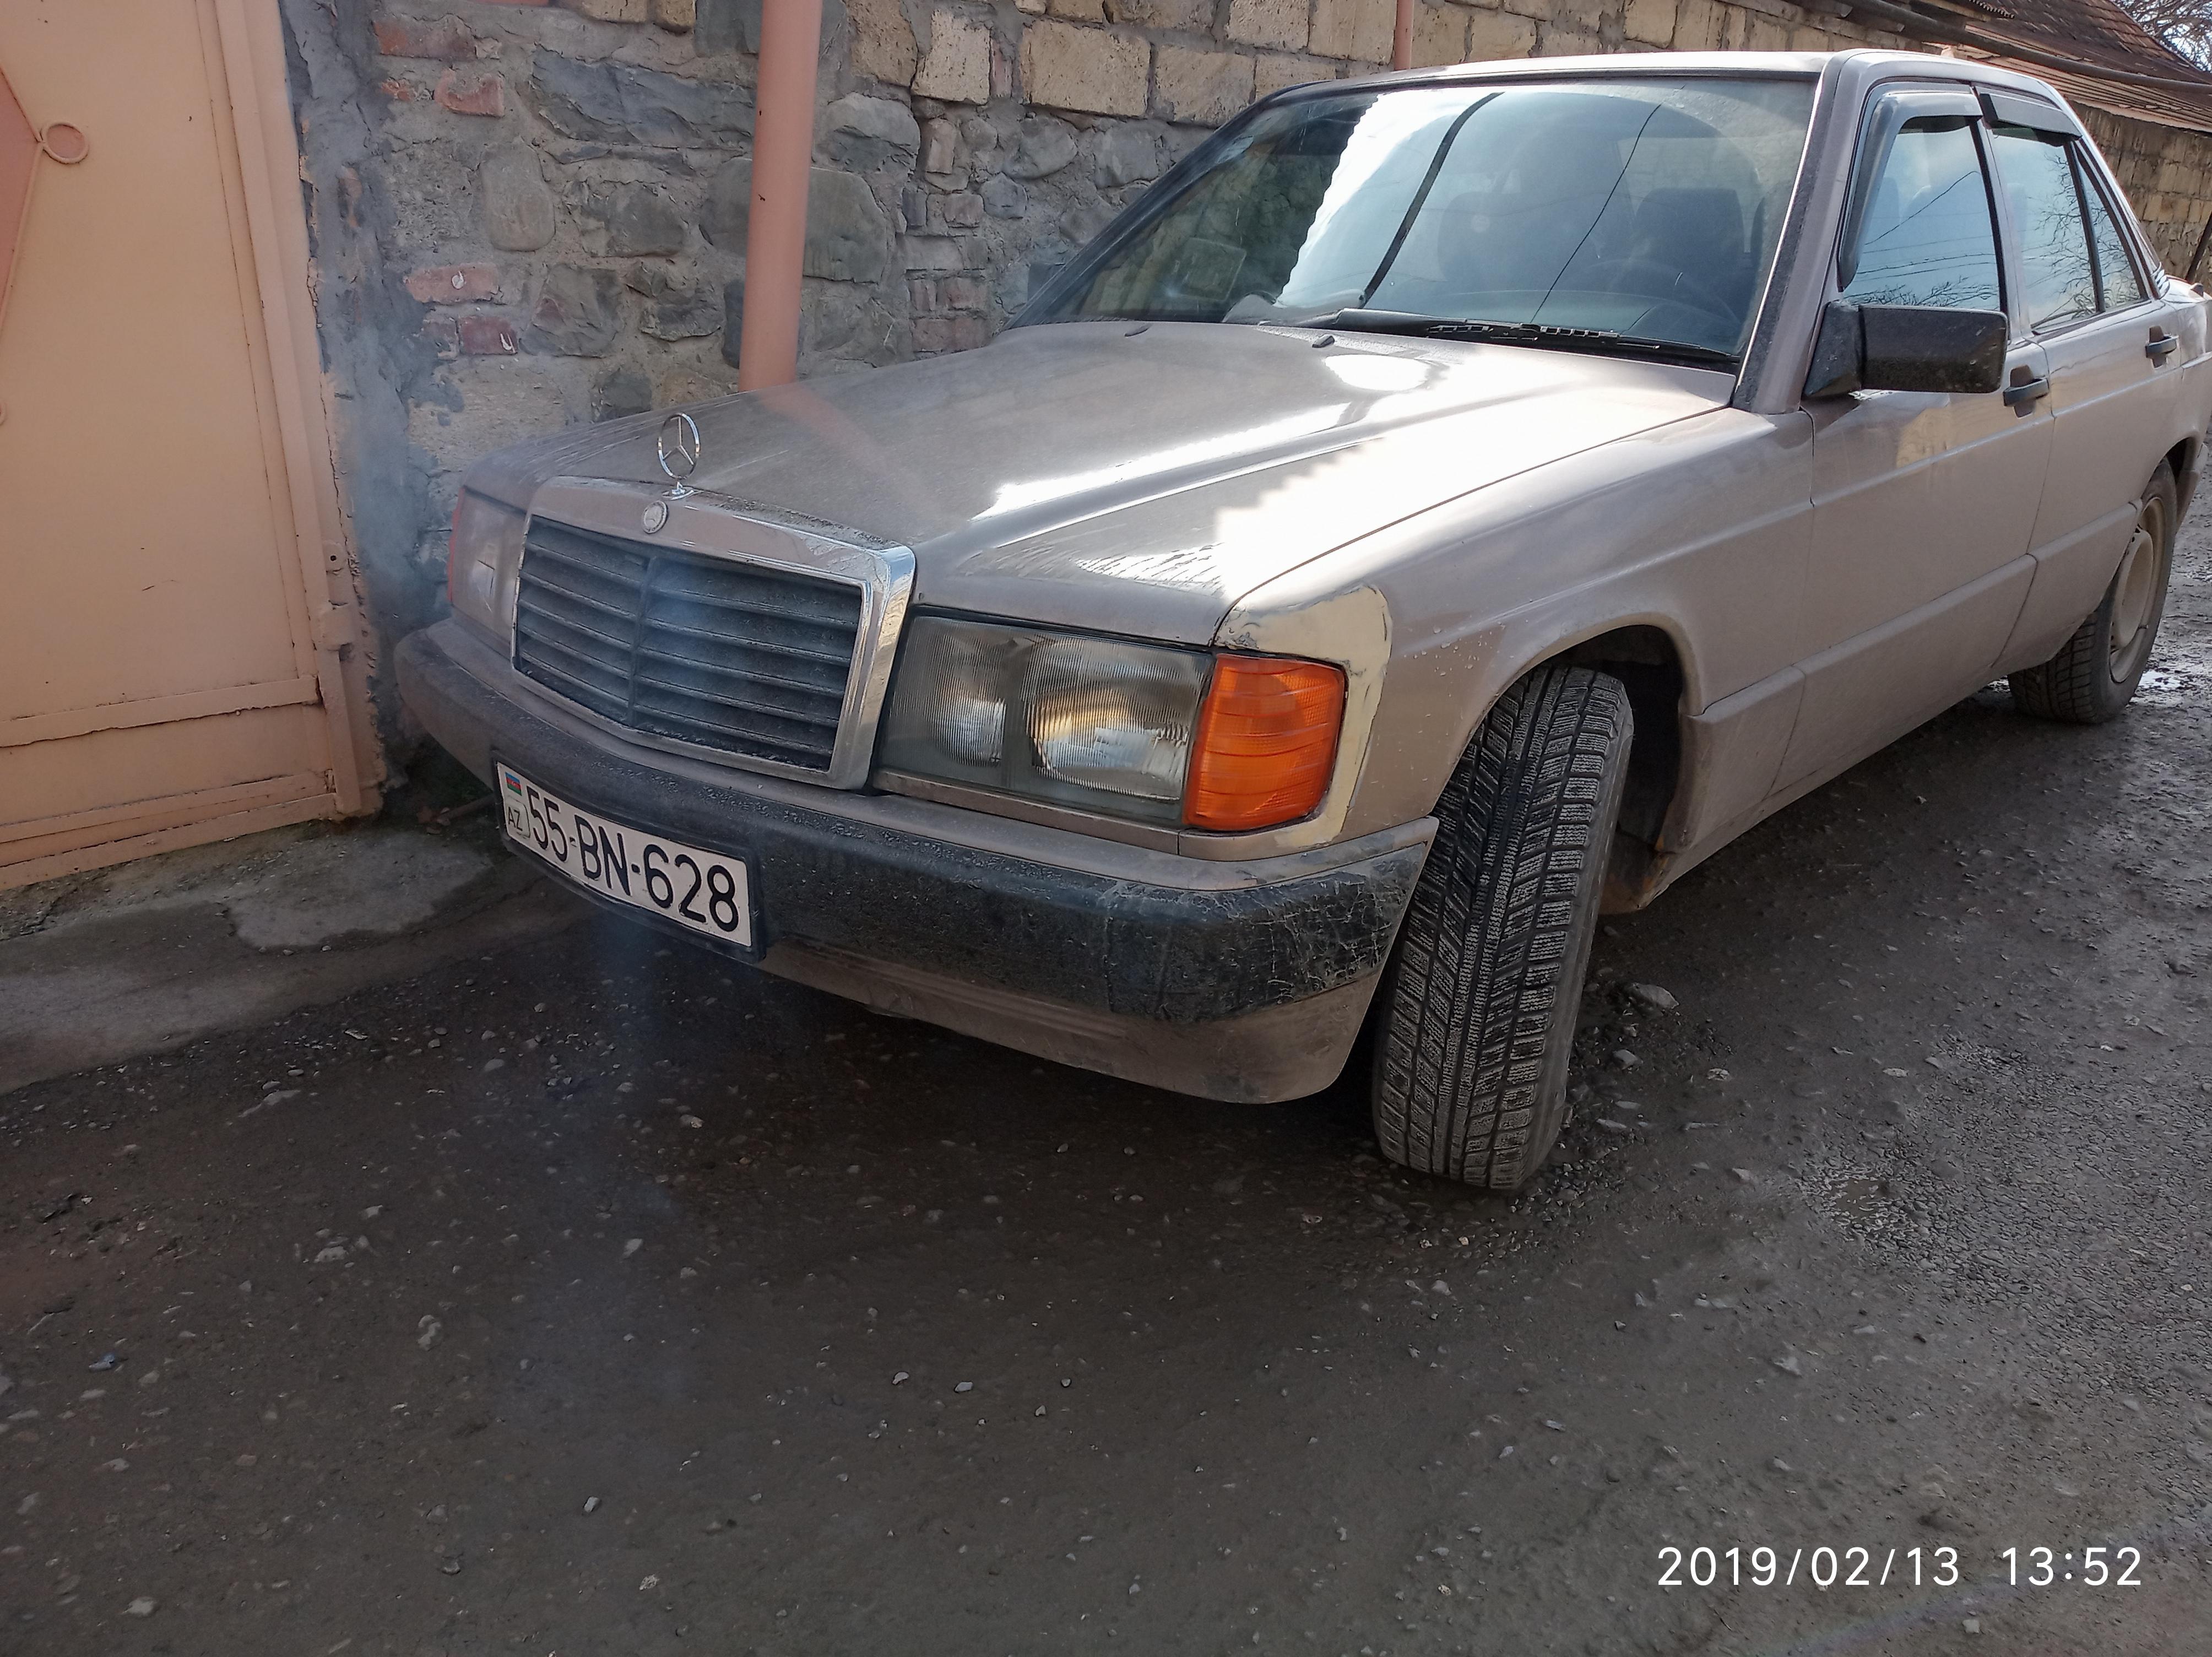 Mercedes-Benz 190 1.8(lt) 1993 İkinci əl  $5000